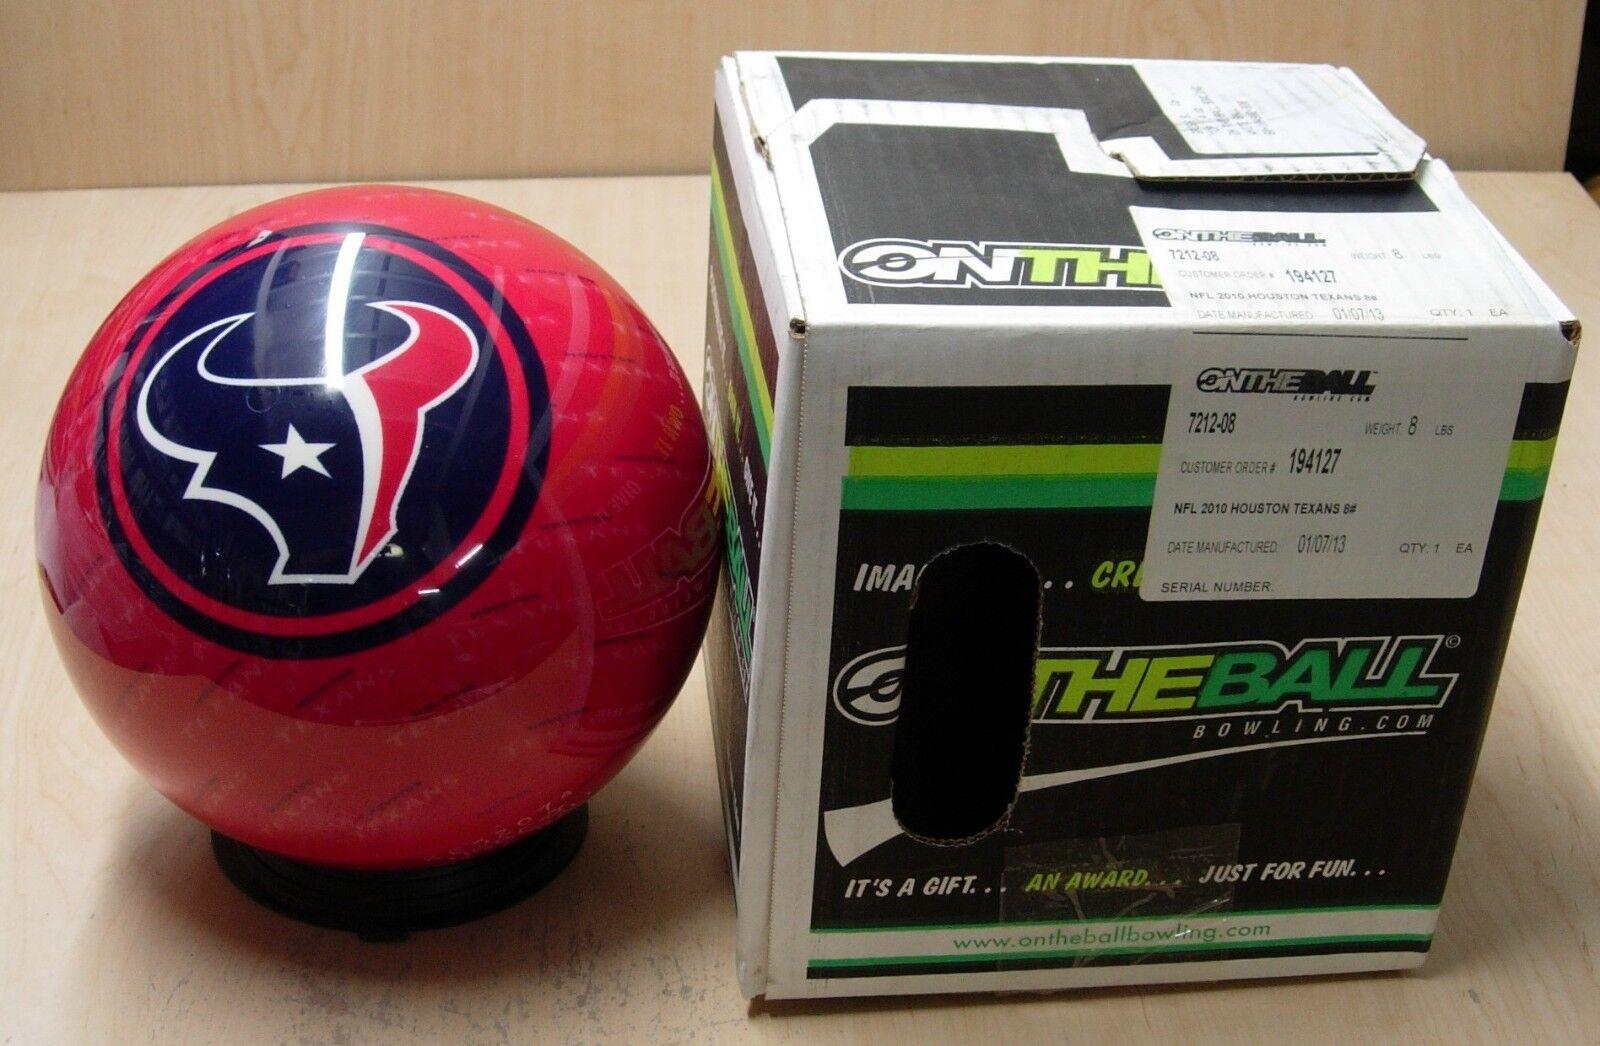 8oz TW 1.4 Bowling Ball OTB Viz-A-Ball Retired 2010 NFL Houston TEXANS